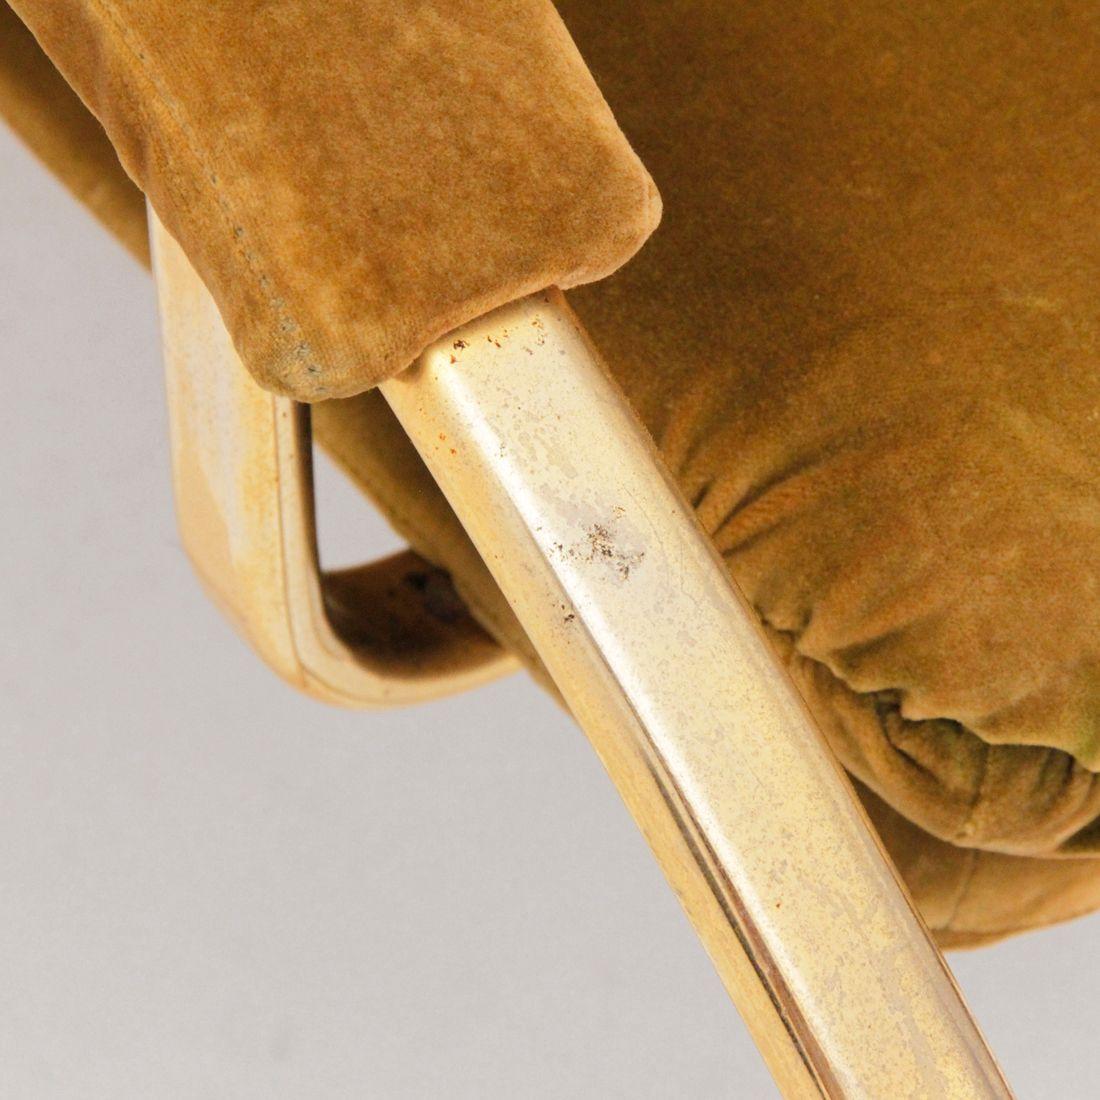 Italienischer schaukelstuhl mit messing rohrgestell bei for Schaukelstuhl englisch